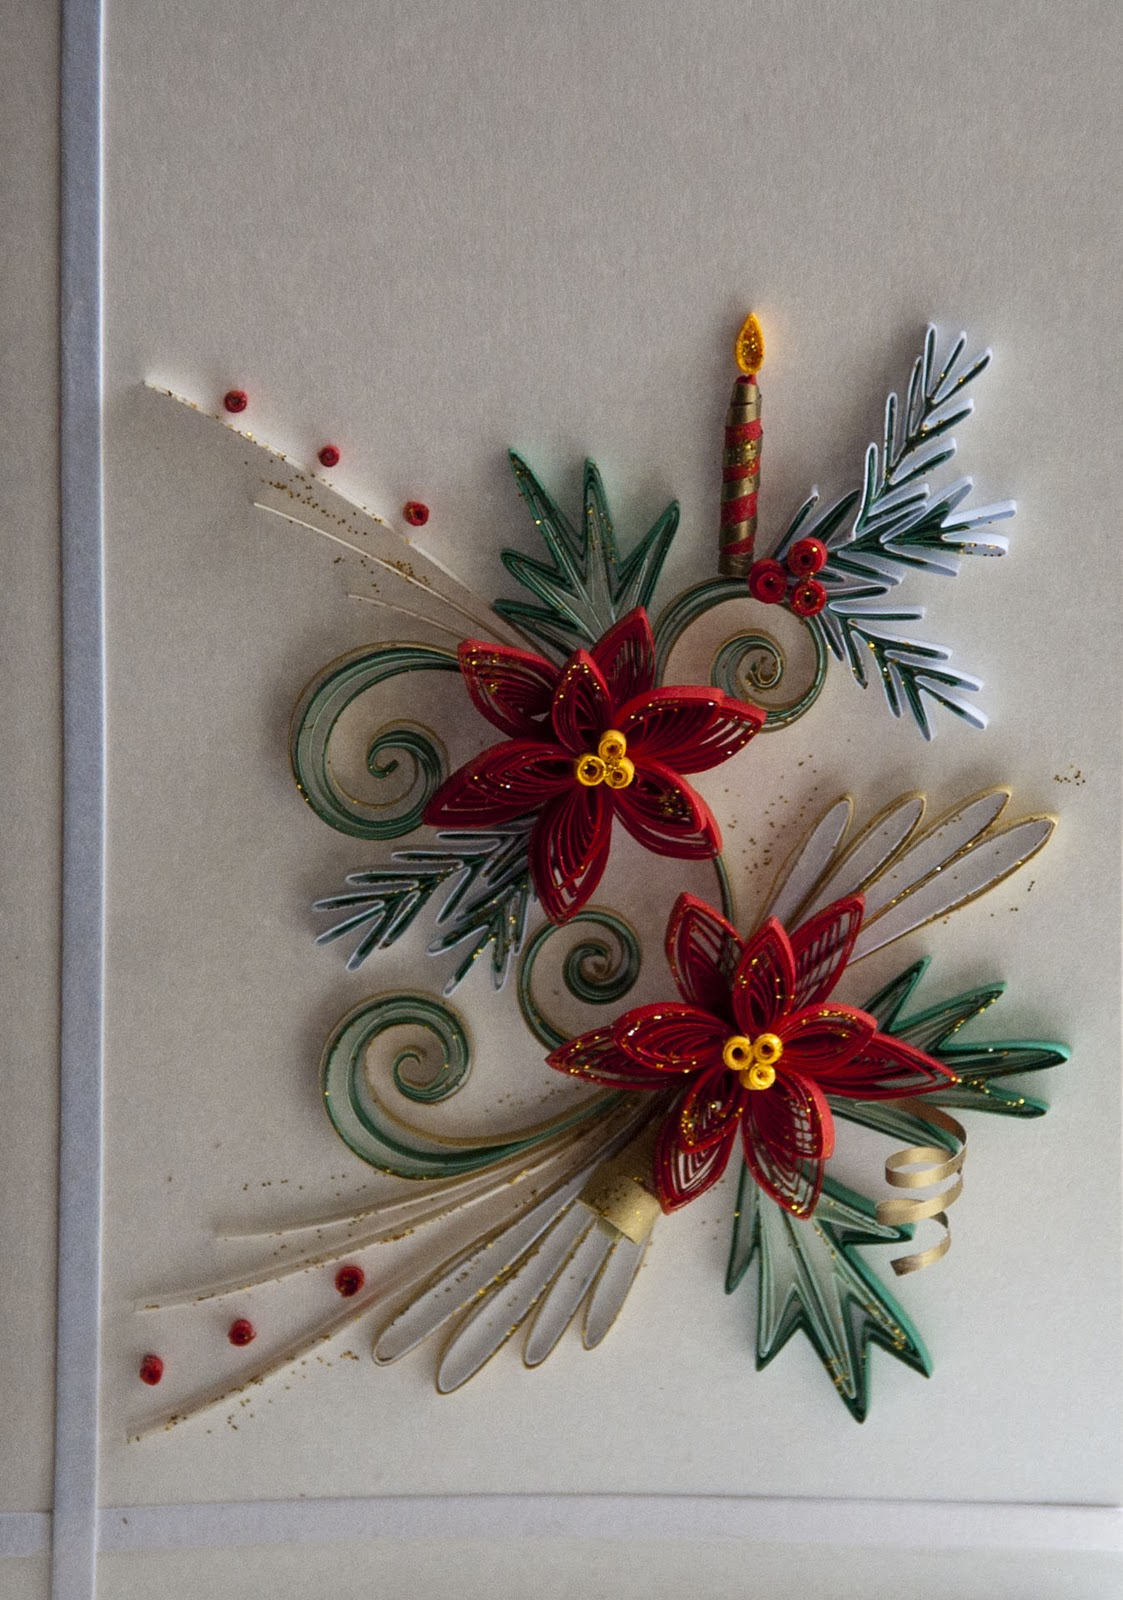 #68312A Neli Quilling Art: Quilling Christmas 11 6013 decoration de noel quilling 1123x1600 px @ aertt.com